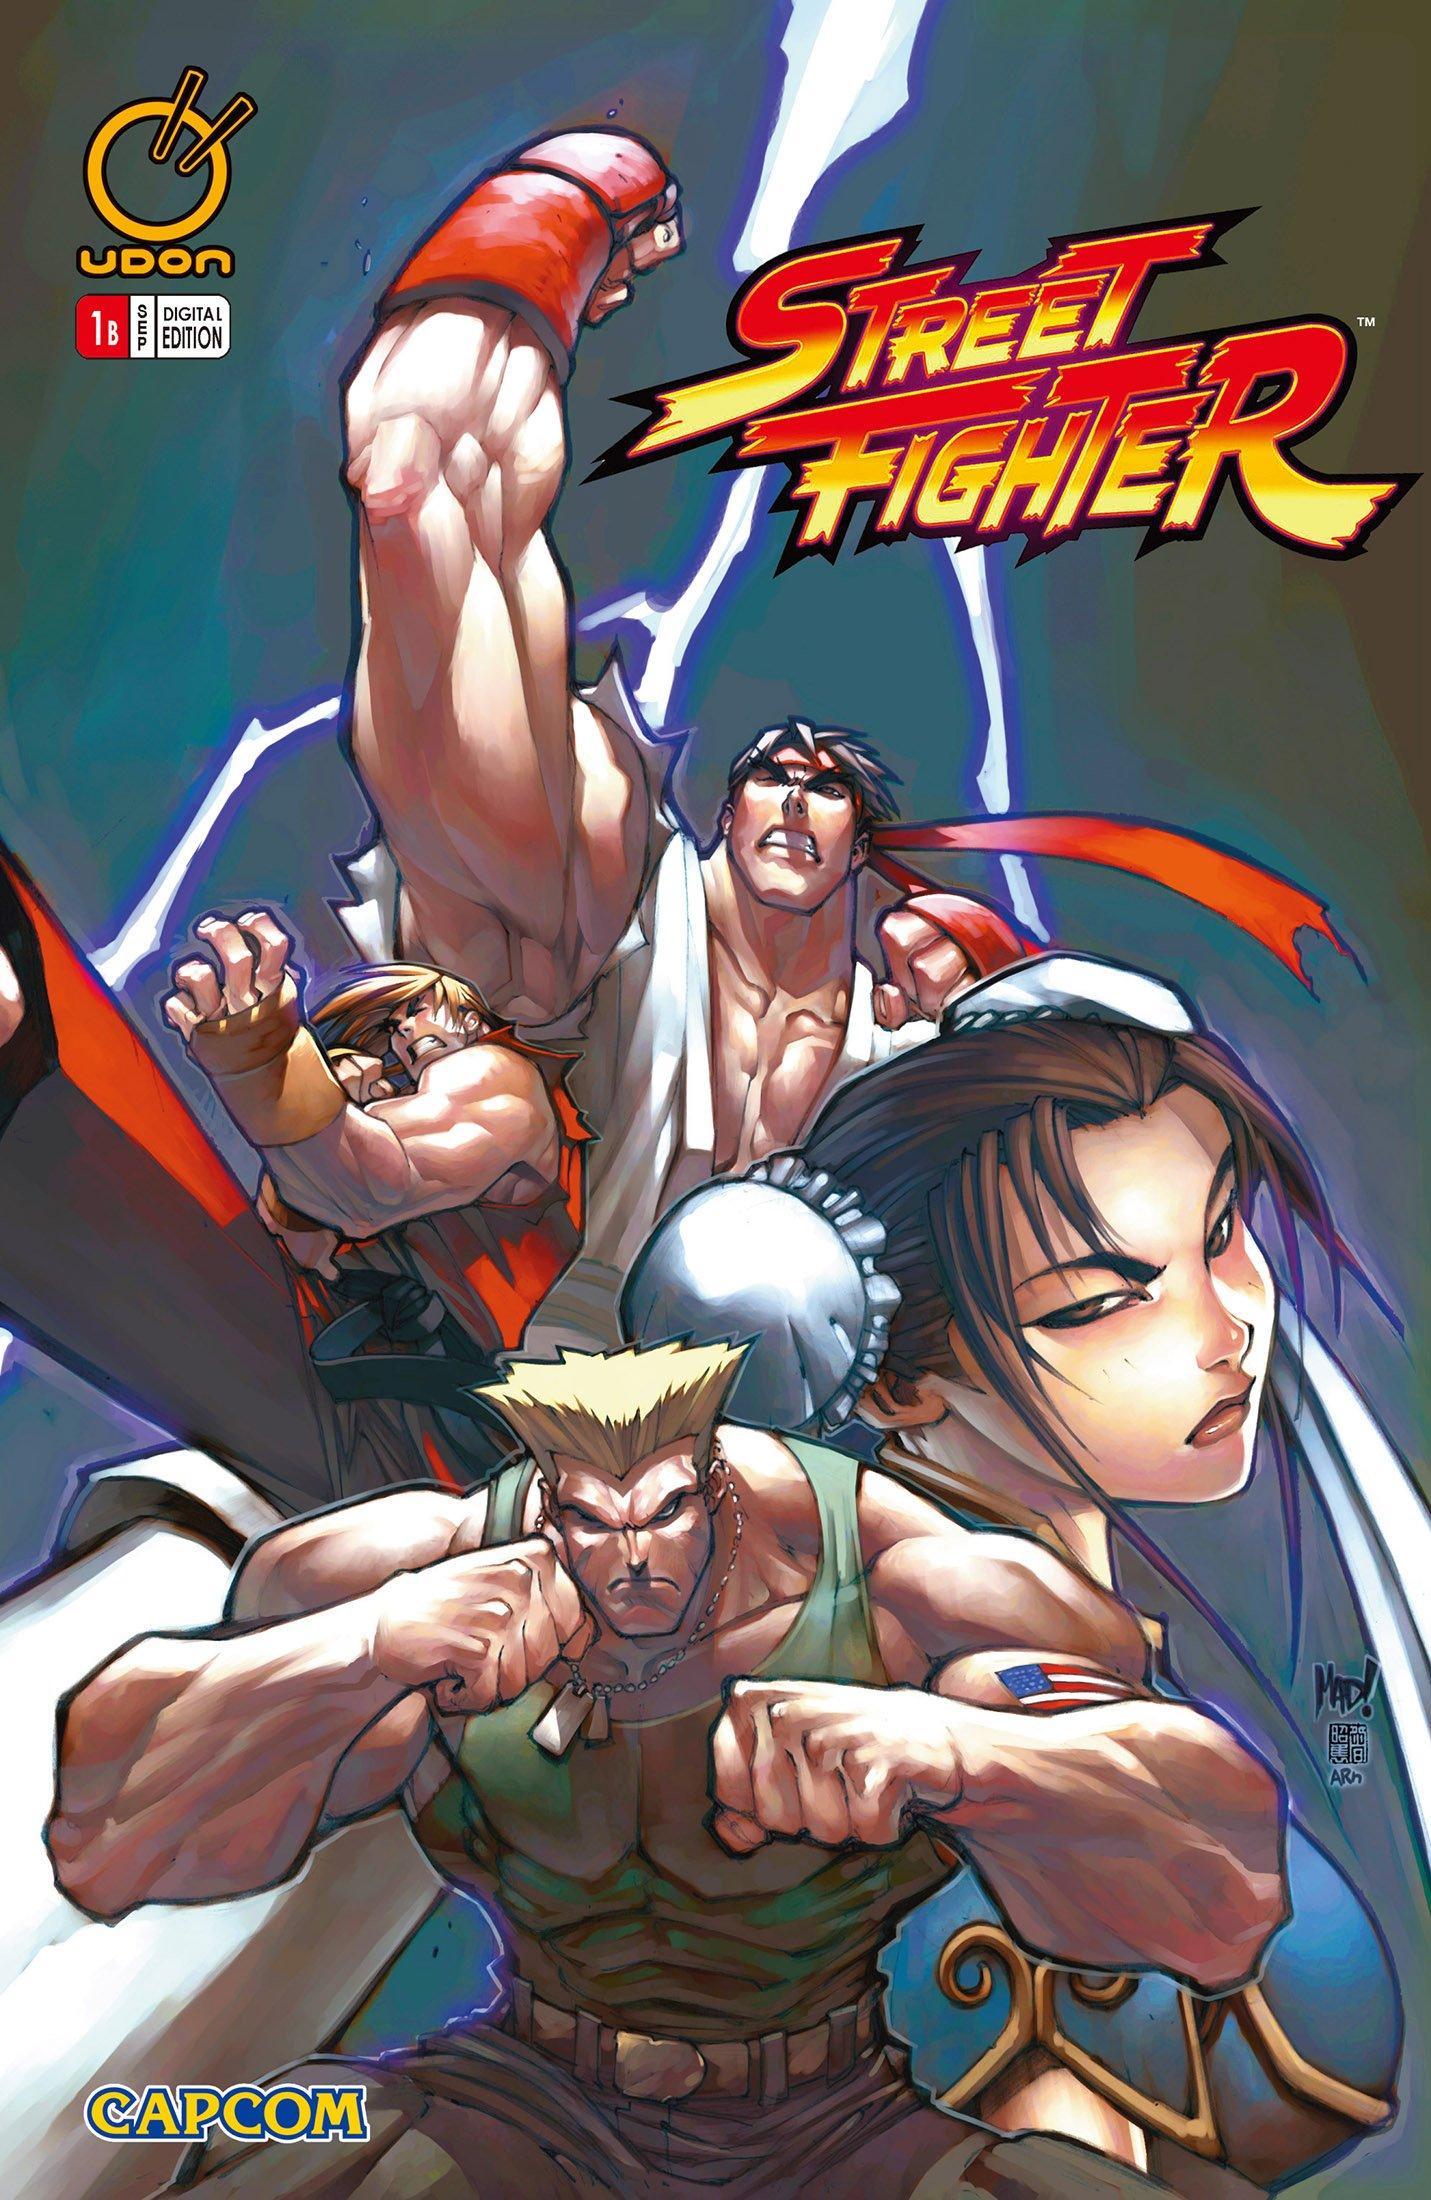 Street Fighter Vol.1 001 (September 2003) (cover b - digital)